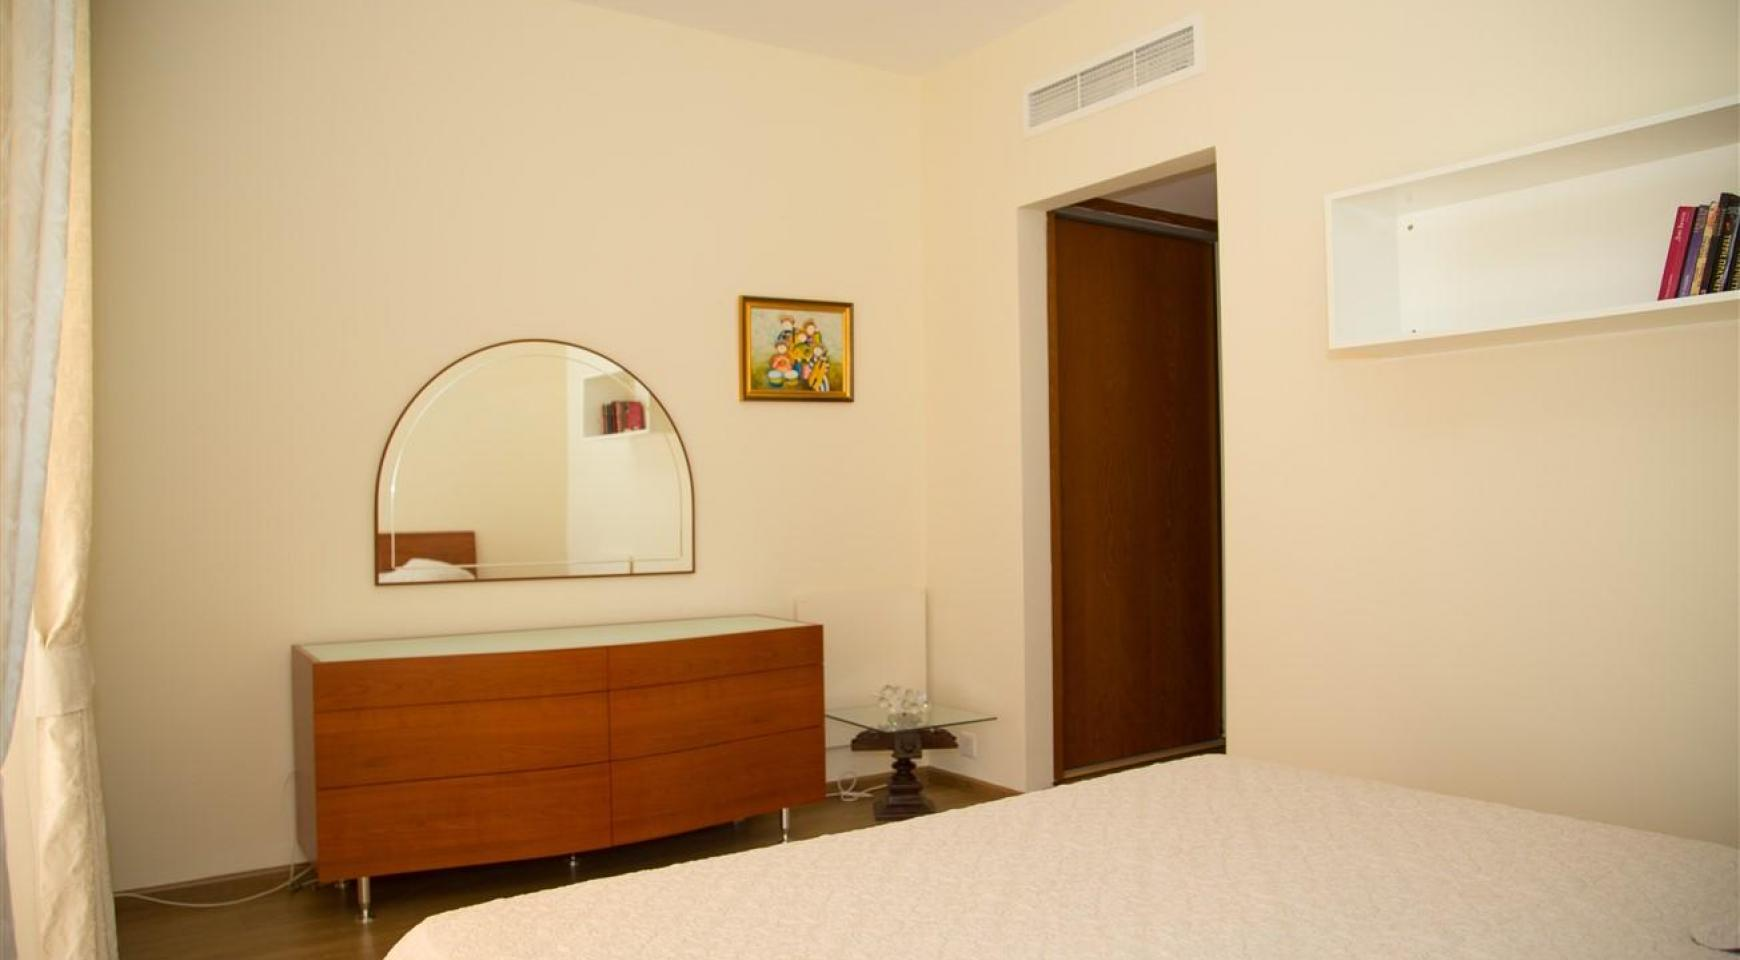 3-Спальная Квартира на Берегу Моря в Комплексе Thera   - 30